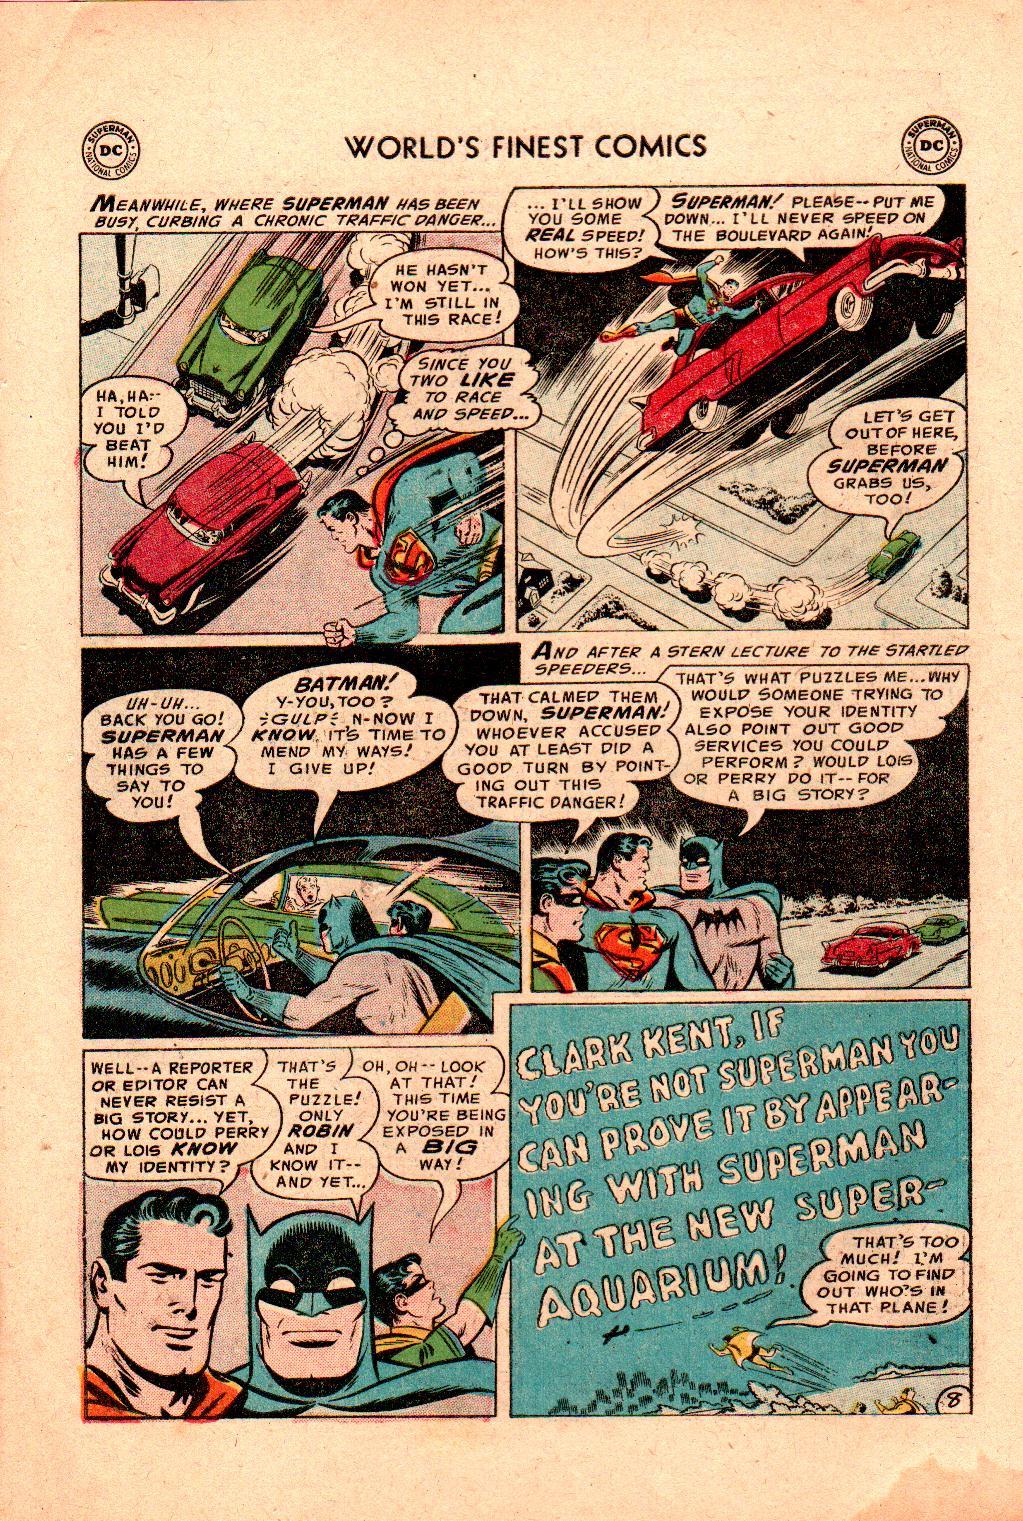 Read online World's Finest Comics comic -  Issue #78 - 10